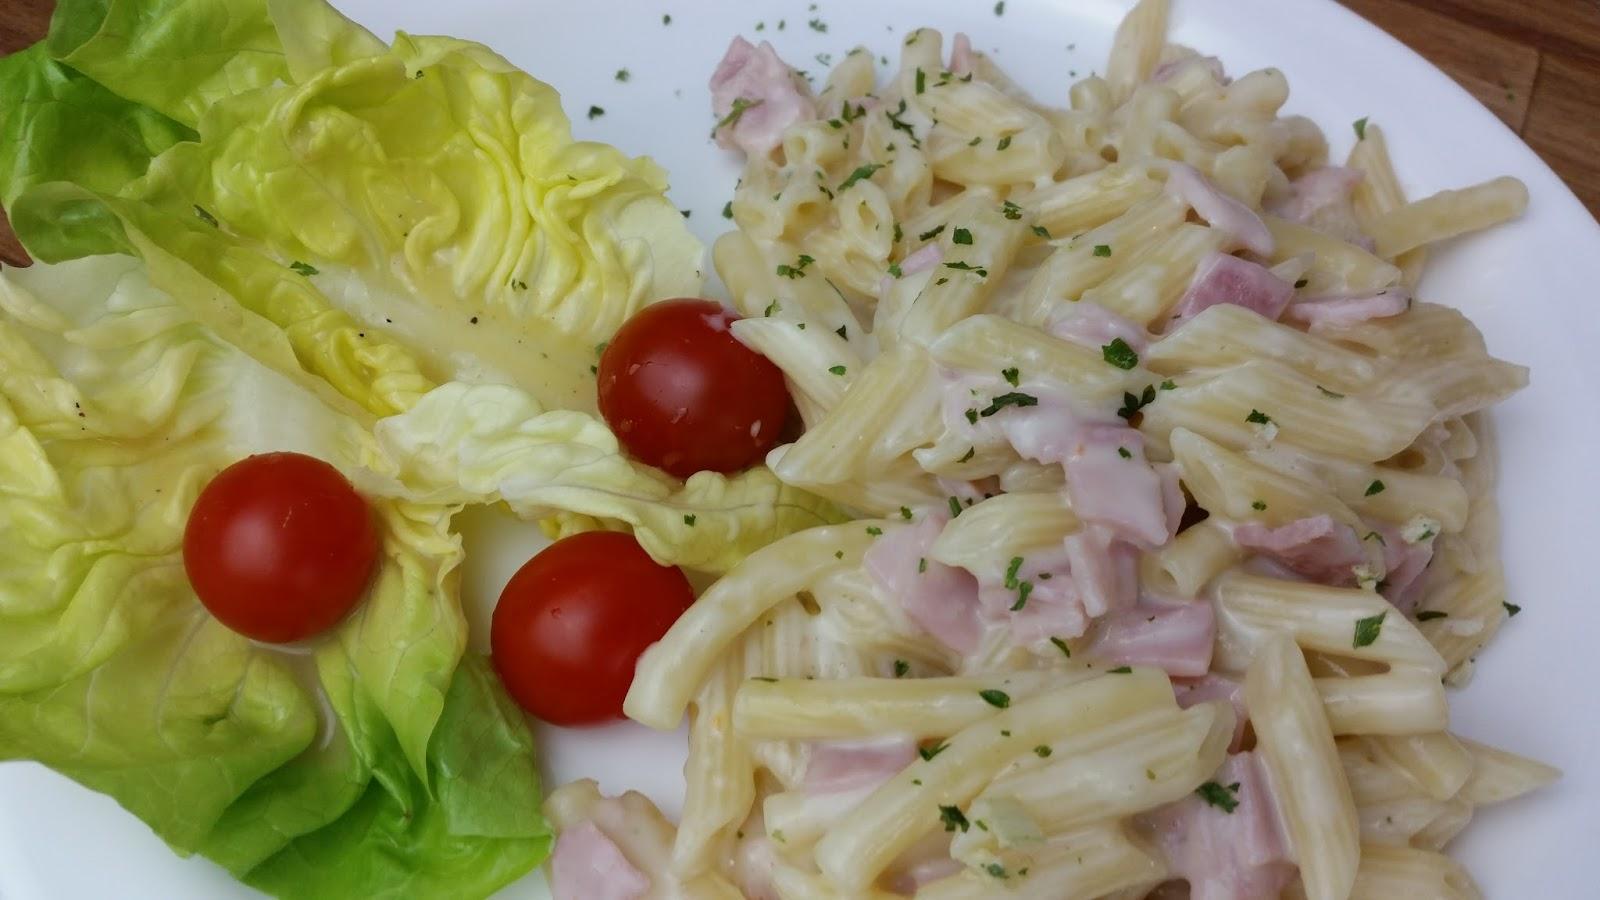 ... Kitchenchaos: Makkaroni mit Käse oder stovetop Mac ´n Cheese